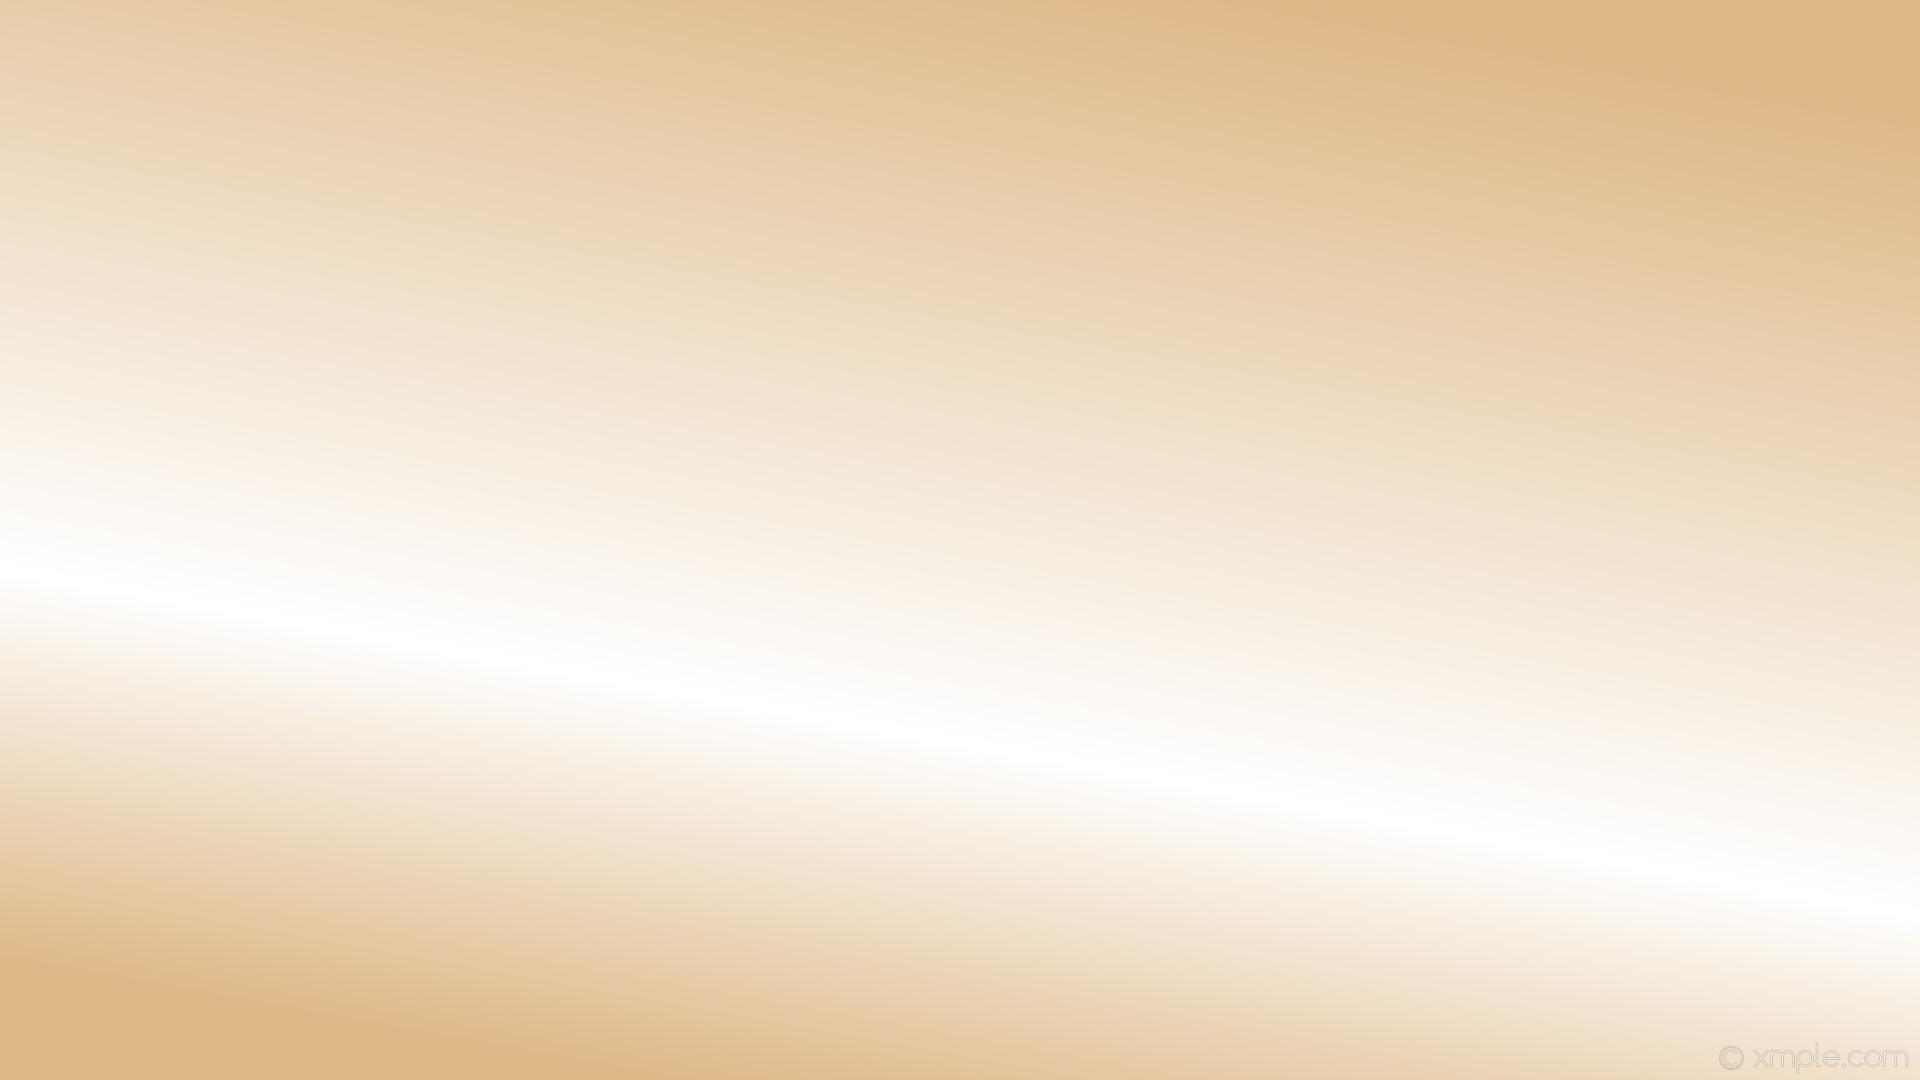 wallpaper brown highlight gradient white linear burly wood #deb887 #ffffff  240° 33%